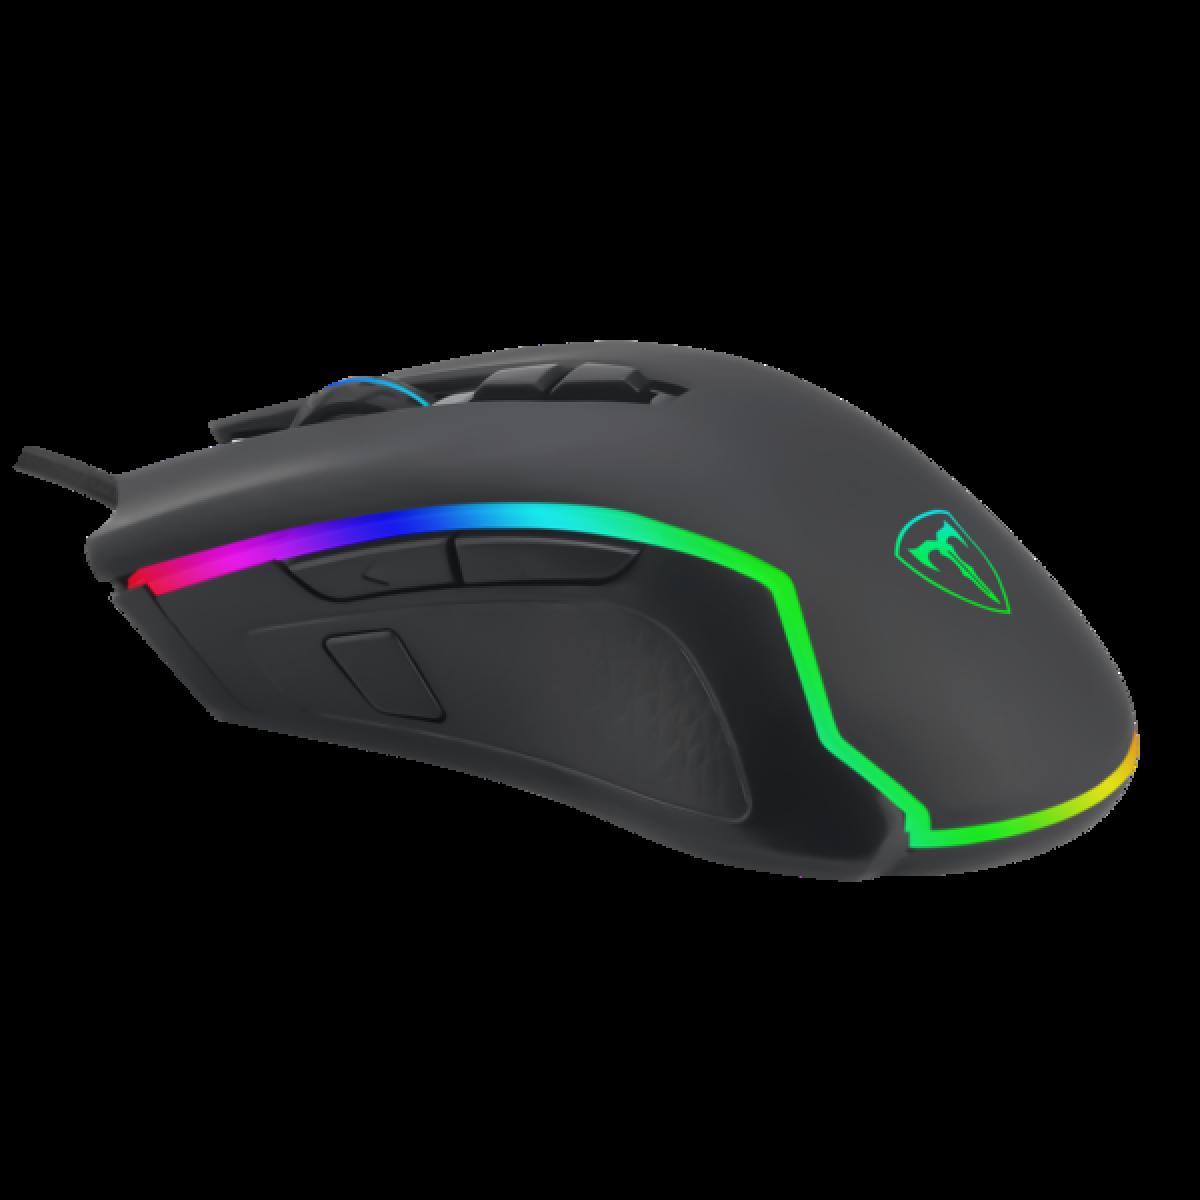 Mouse Gamer T-Dagger Second Lieutenant, RGB 8000 DPI, 8 Botões Programáveis, Black, T-TGM300